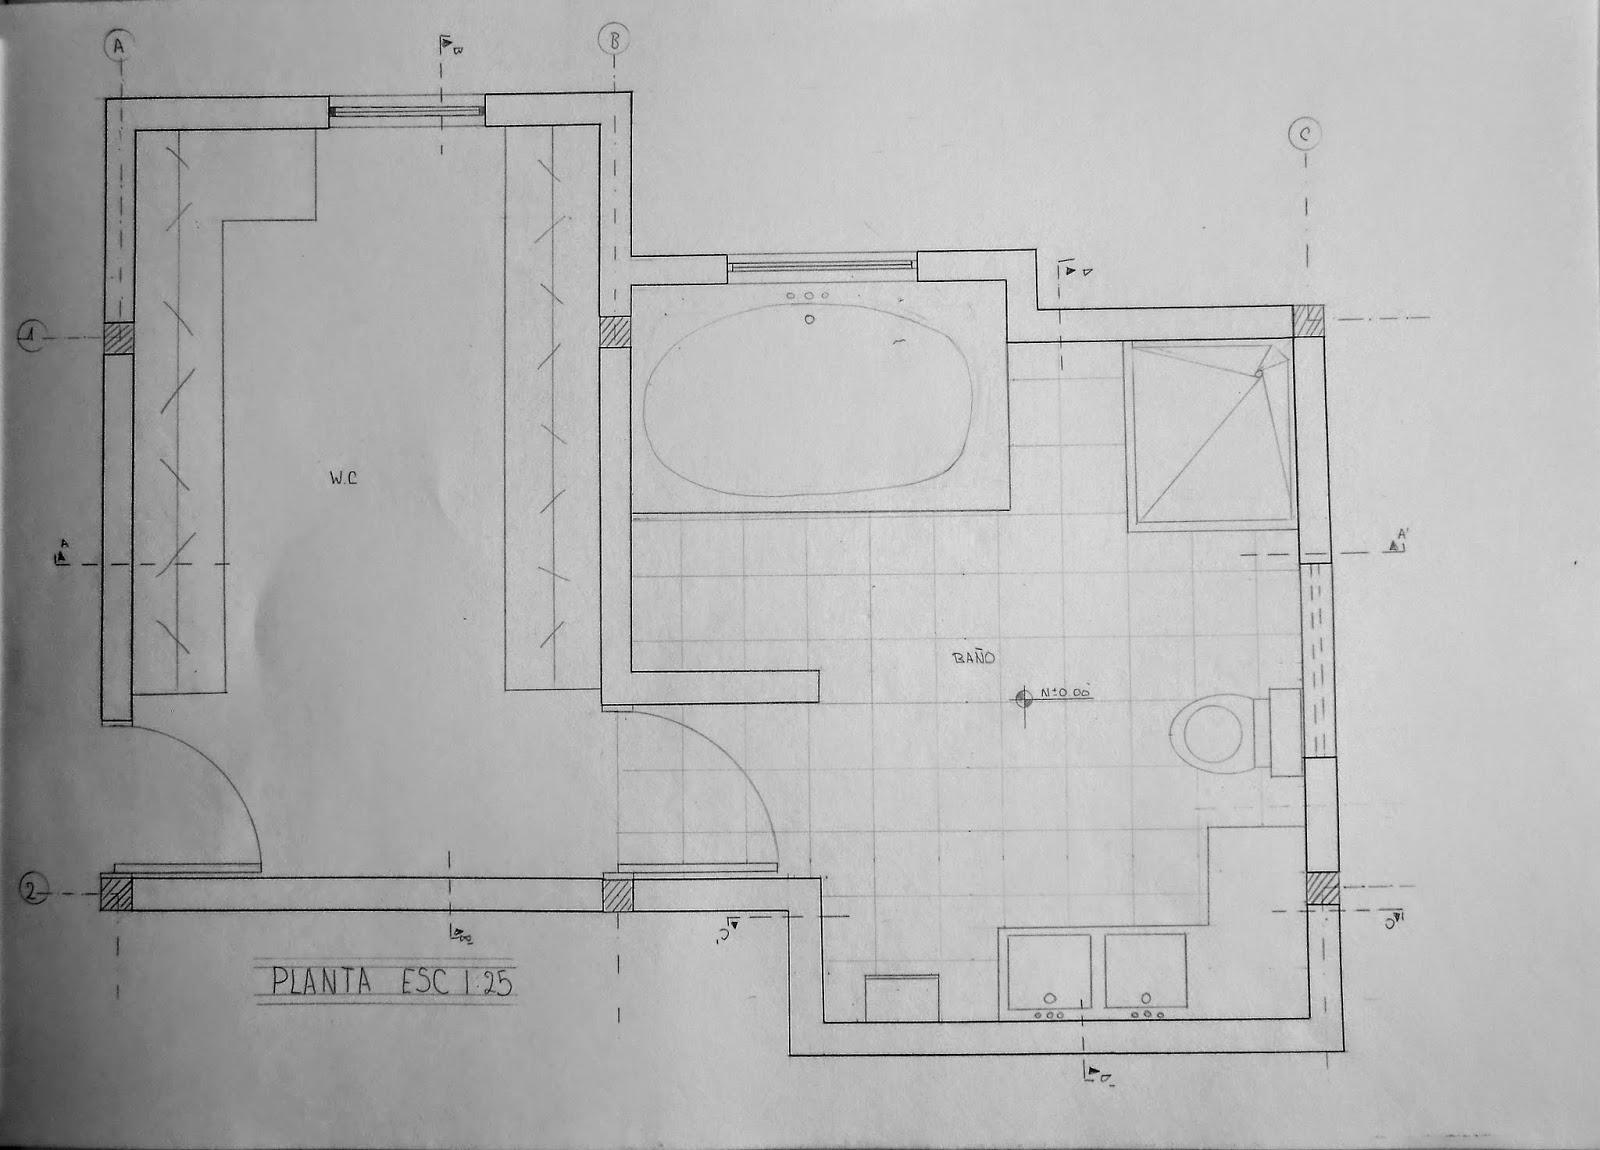 Dise o arquitect nico ii uisek dise o walking closet y ba o for Cuarto con walking closet